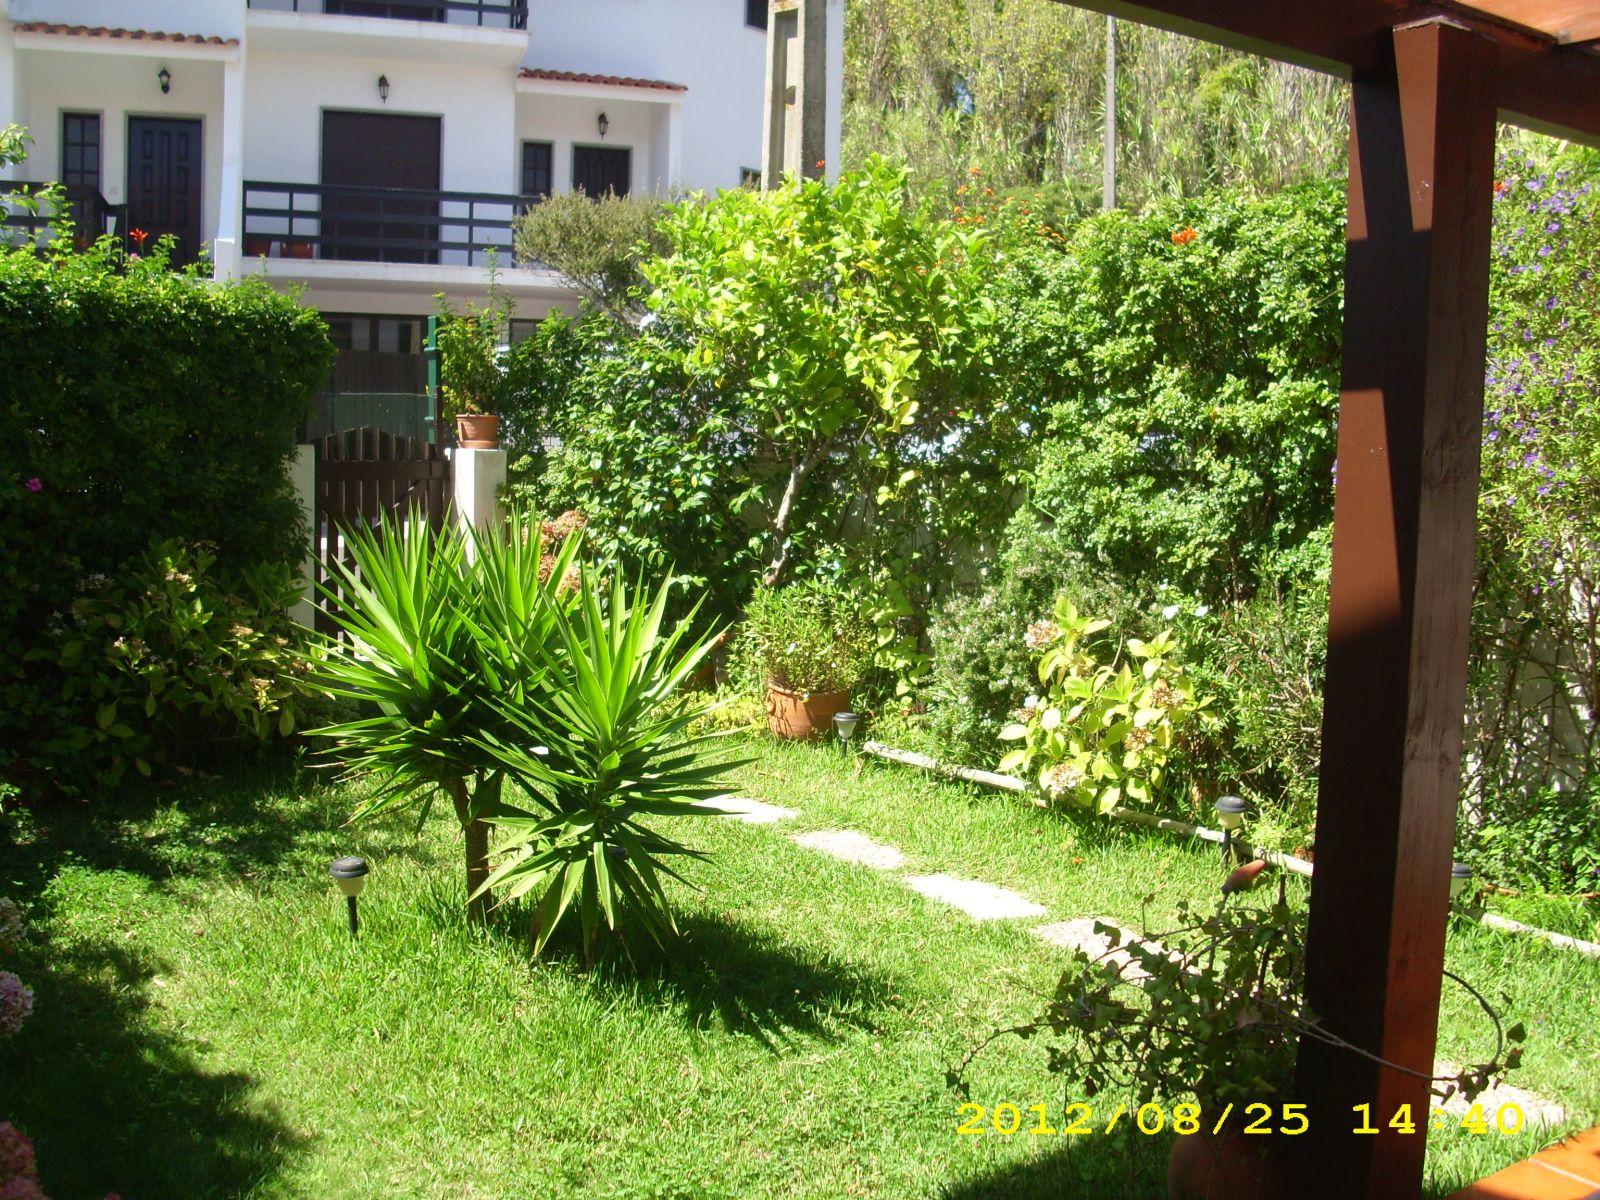 Casa su 3 piani praia de s o louren o gabinohome for Piani di patio